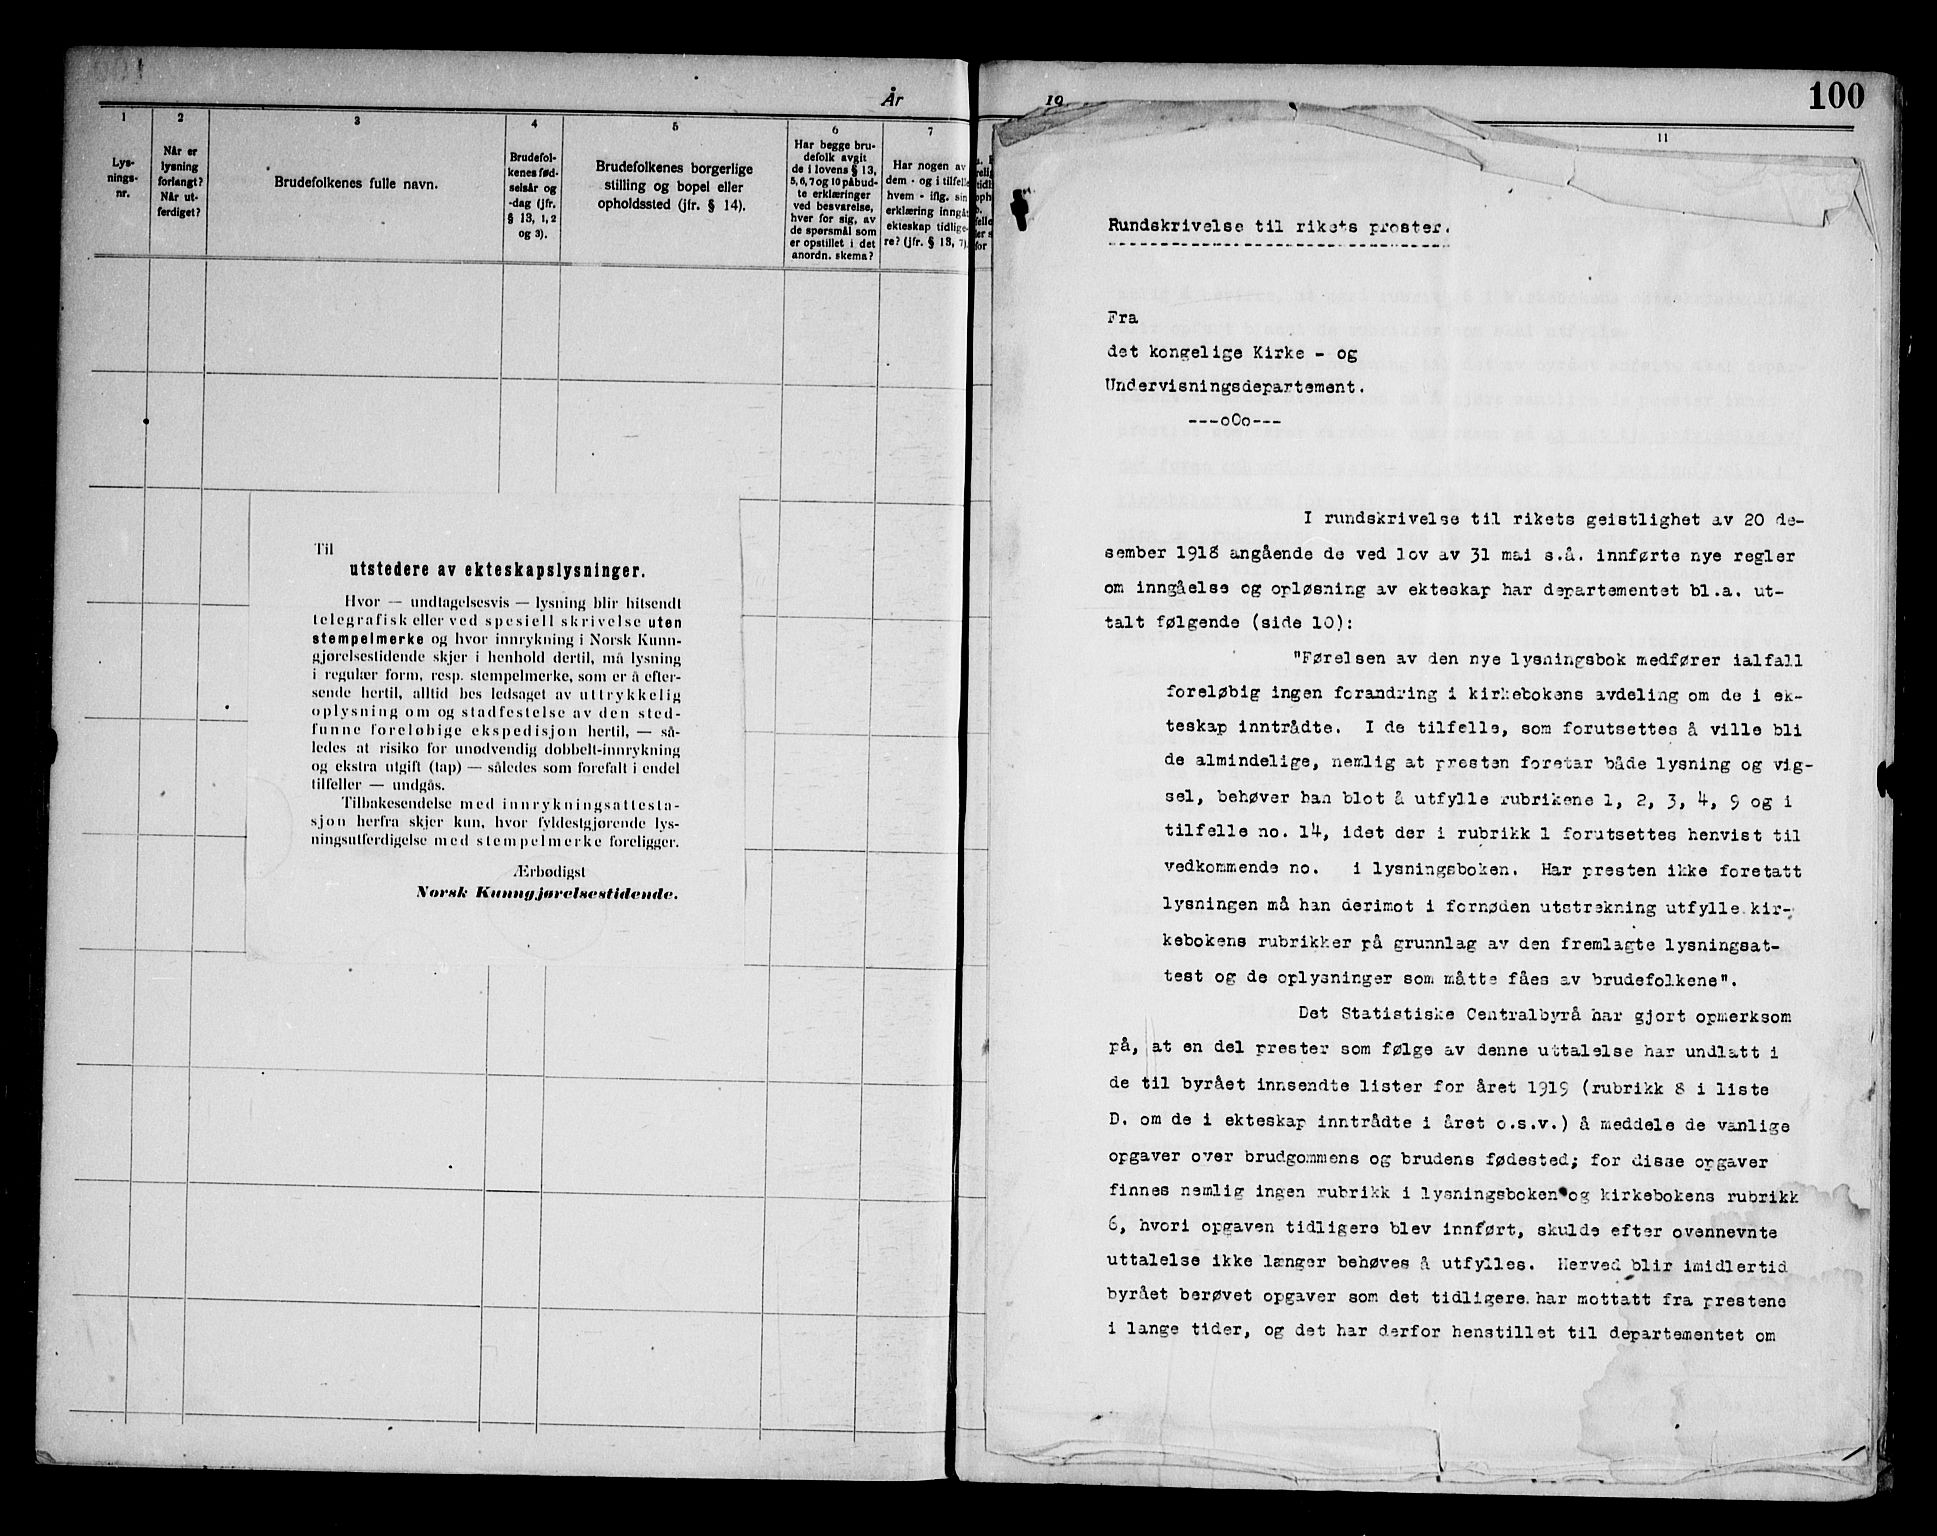 SAKO, Lårdal kirkebøker, H/Ha: Lysningsprotokoll nr. 1, 1919-1969, s. 100